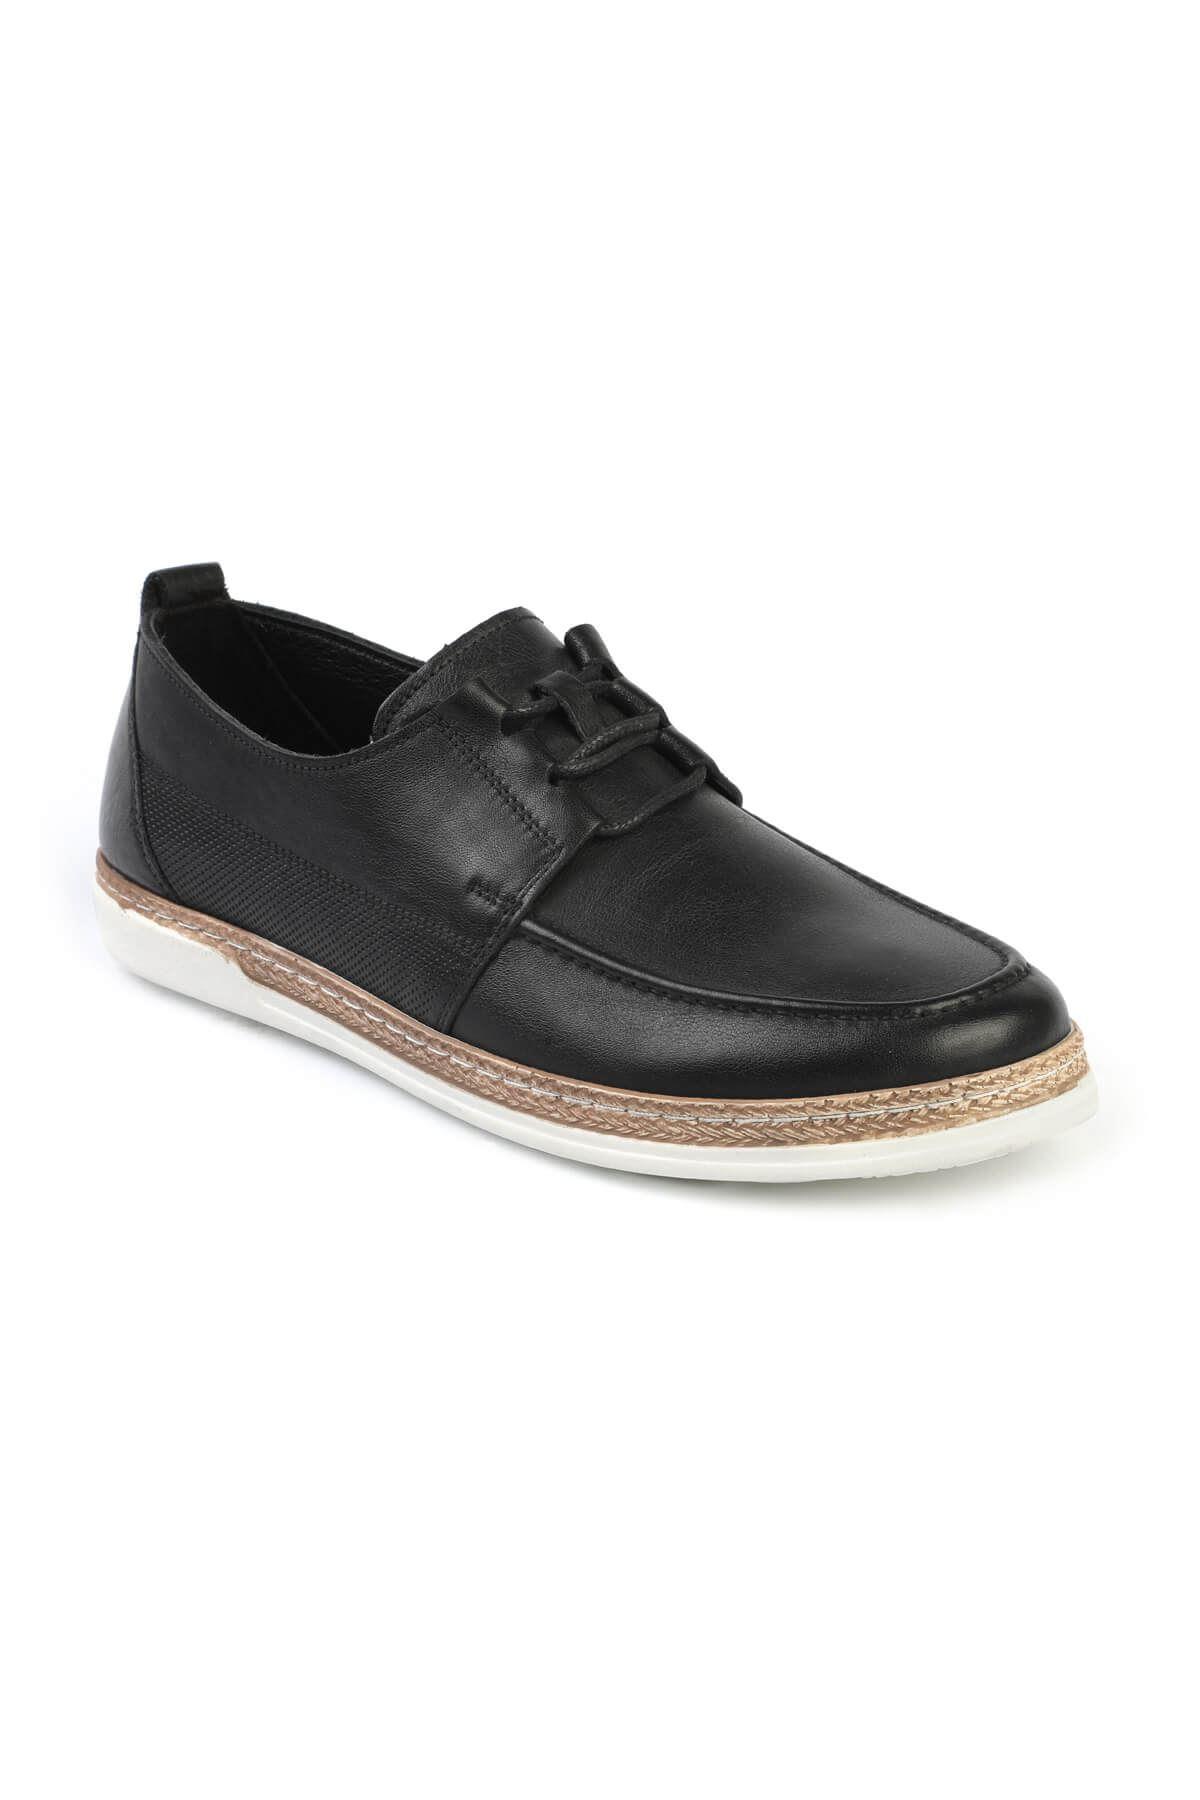 Libero C626 Black Casual Shoes